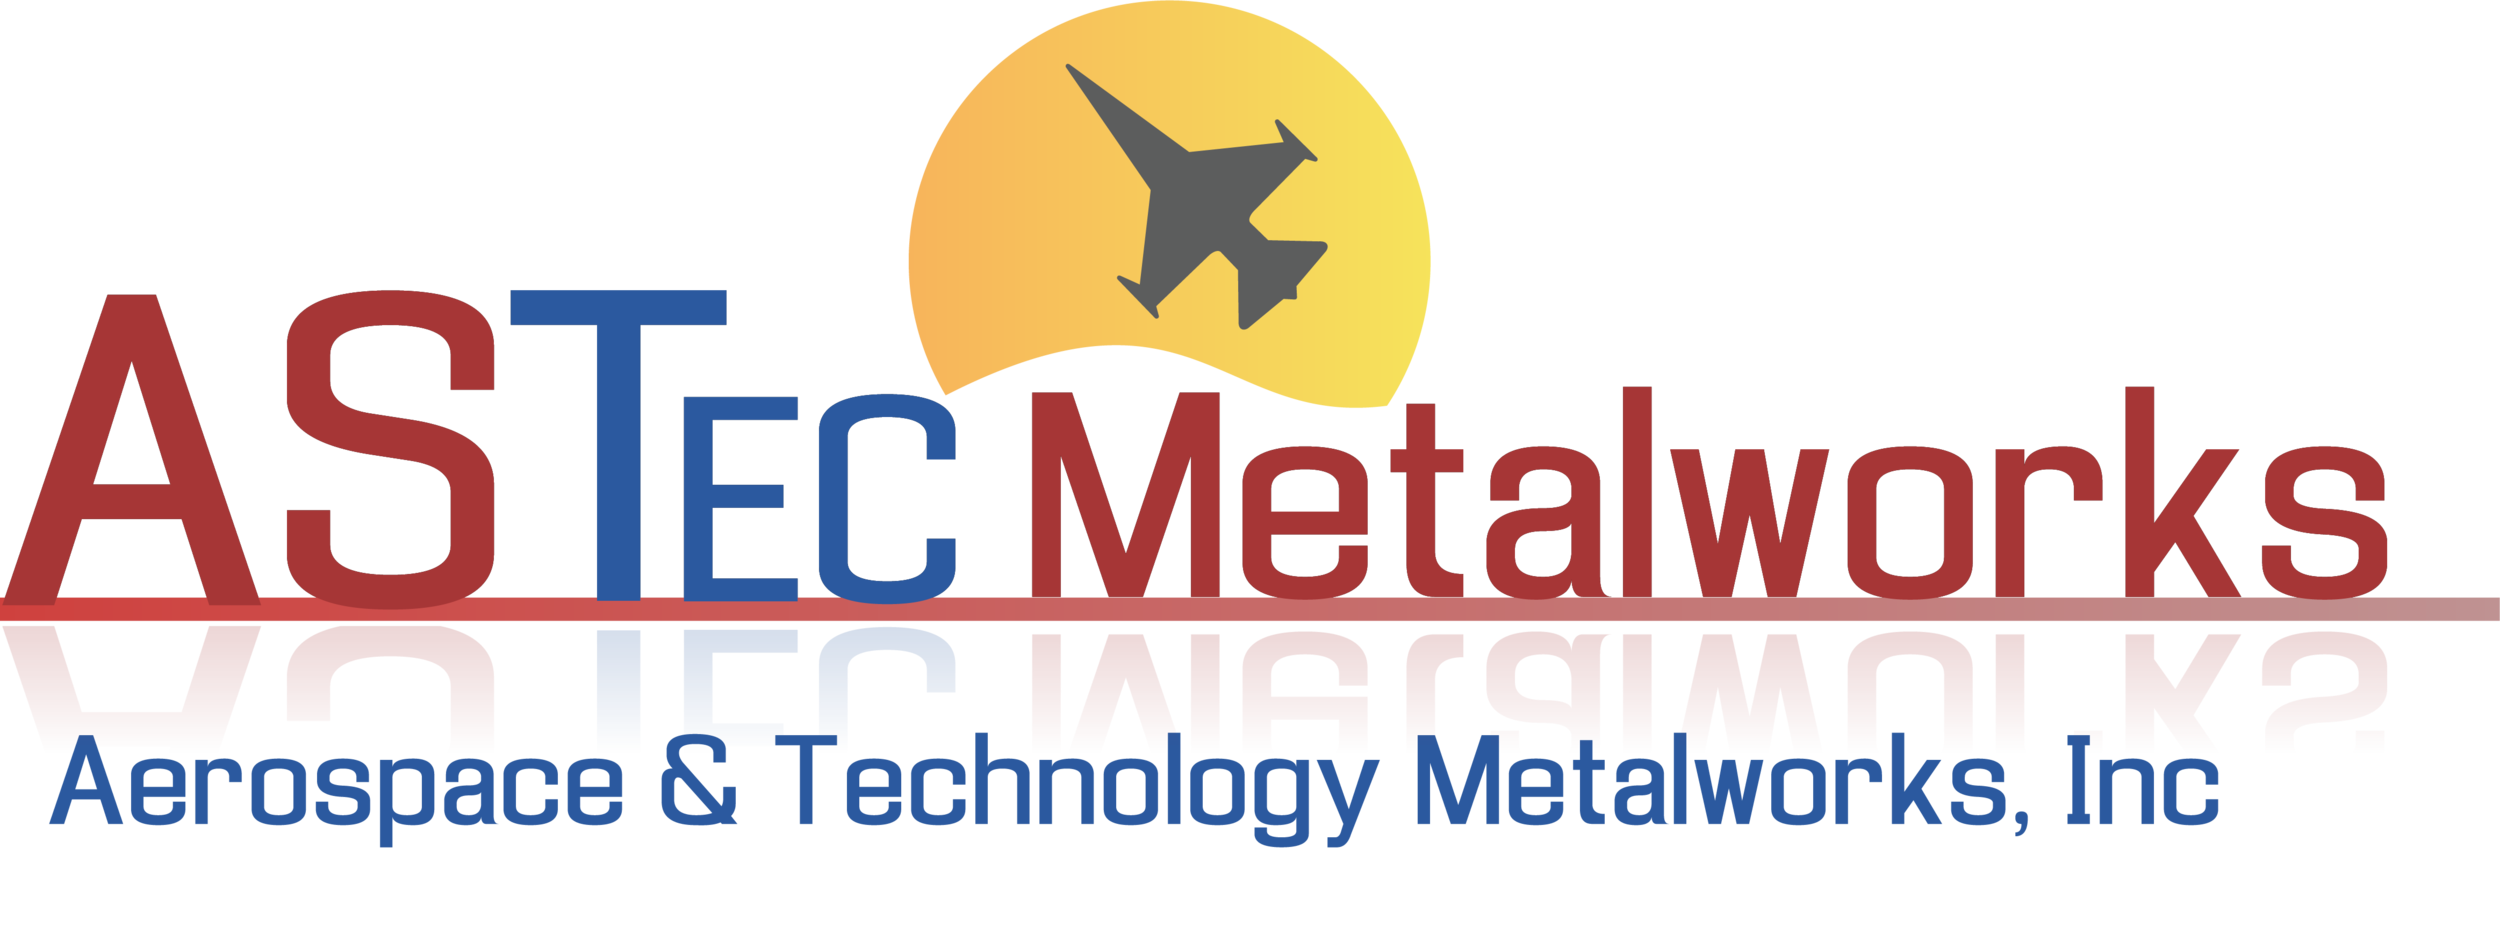 astech-logo-transs.png